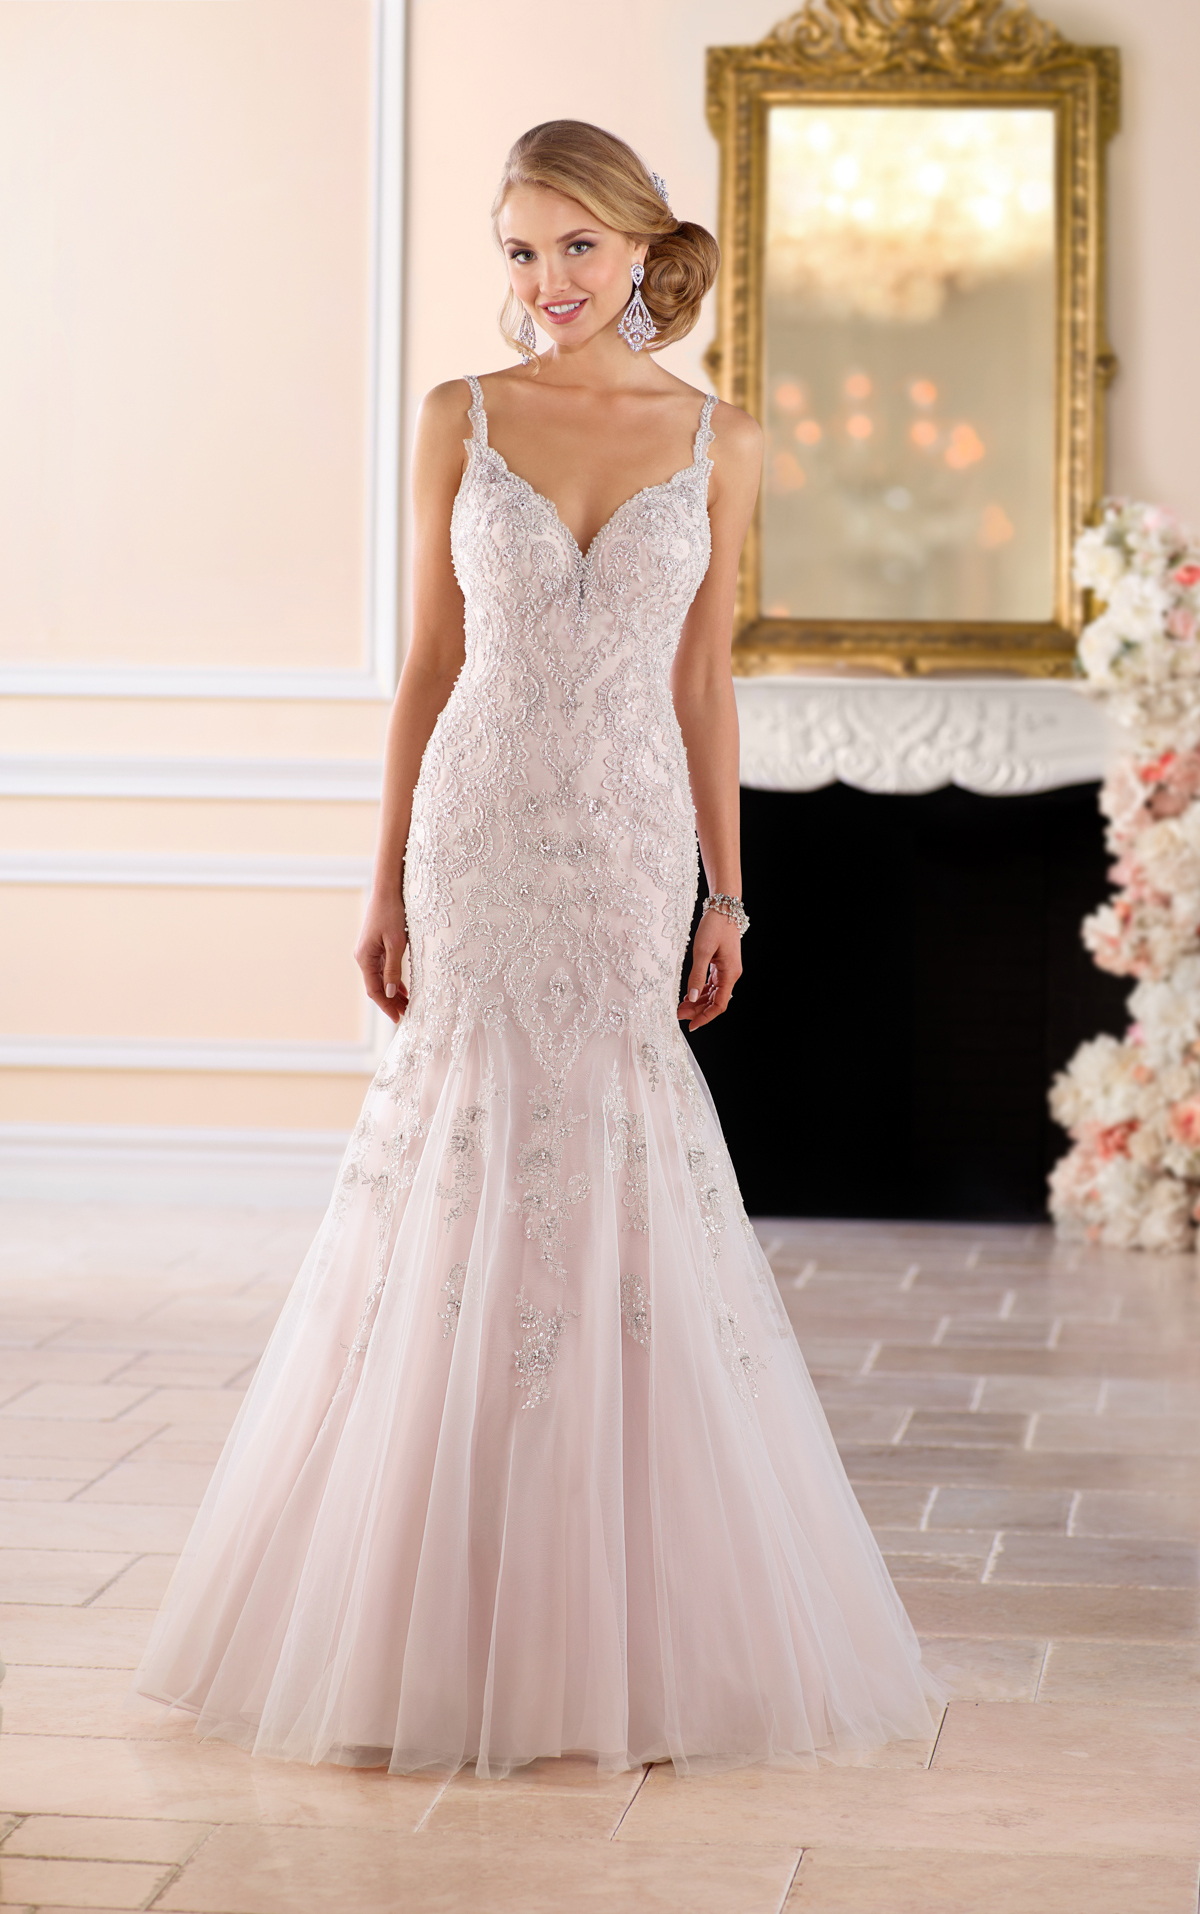 silver beaded wedding dresses photo - 1